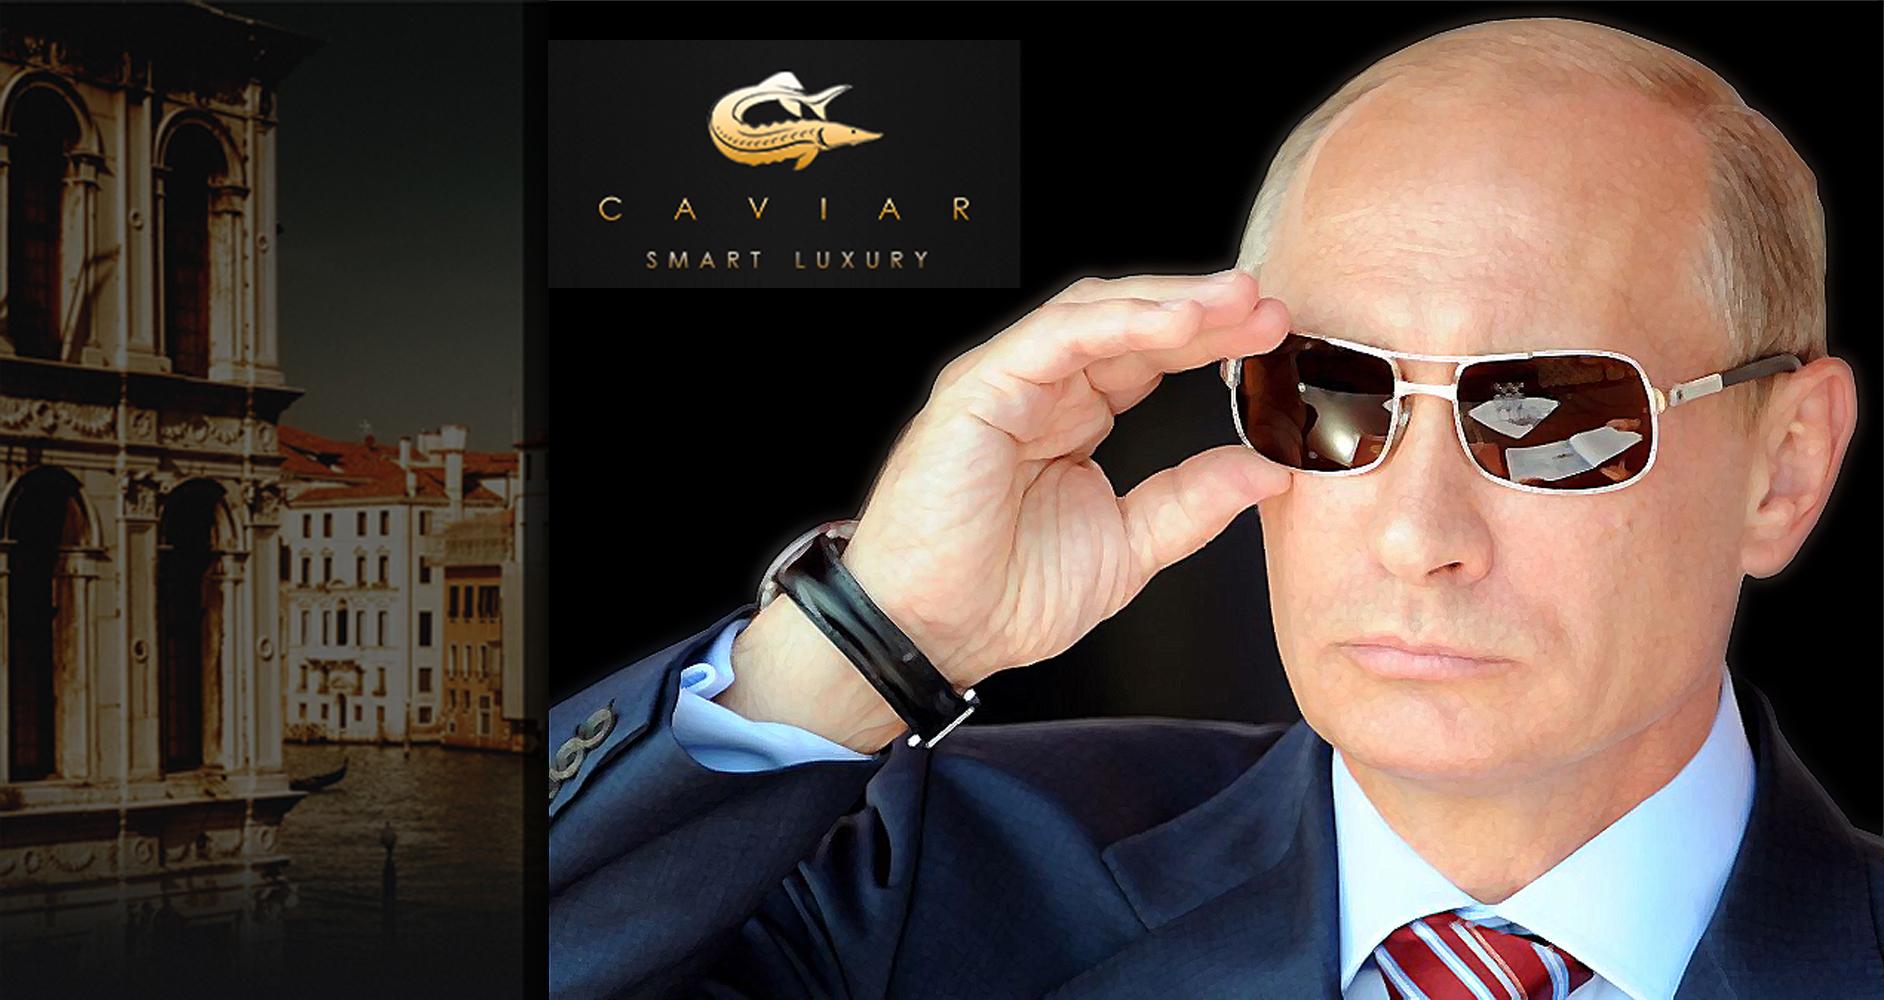 Jeweler Creates Idiotic $3,000 Russian Leader Apple Watches